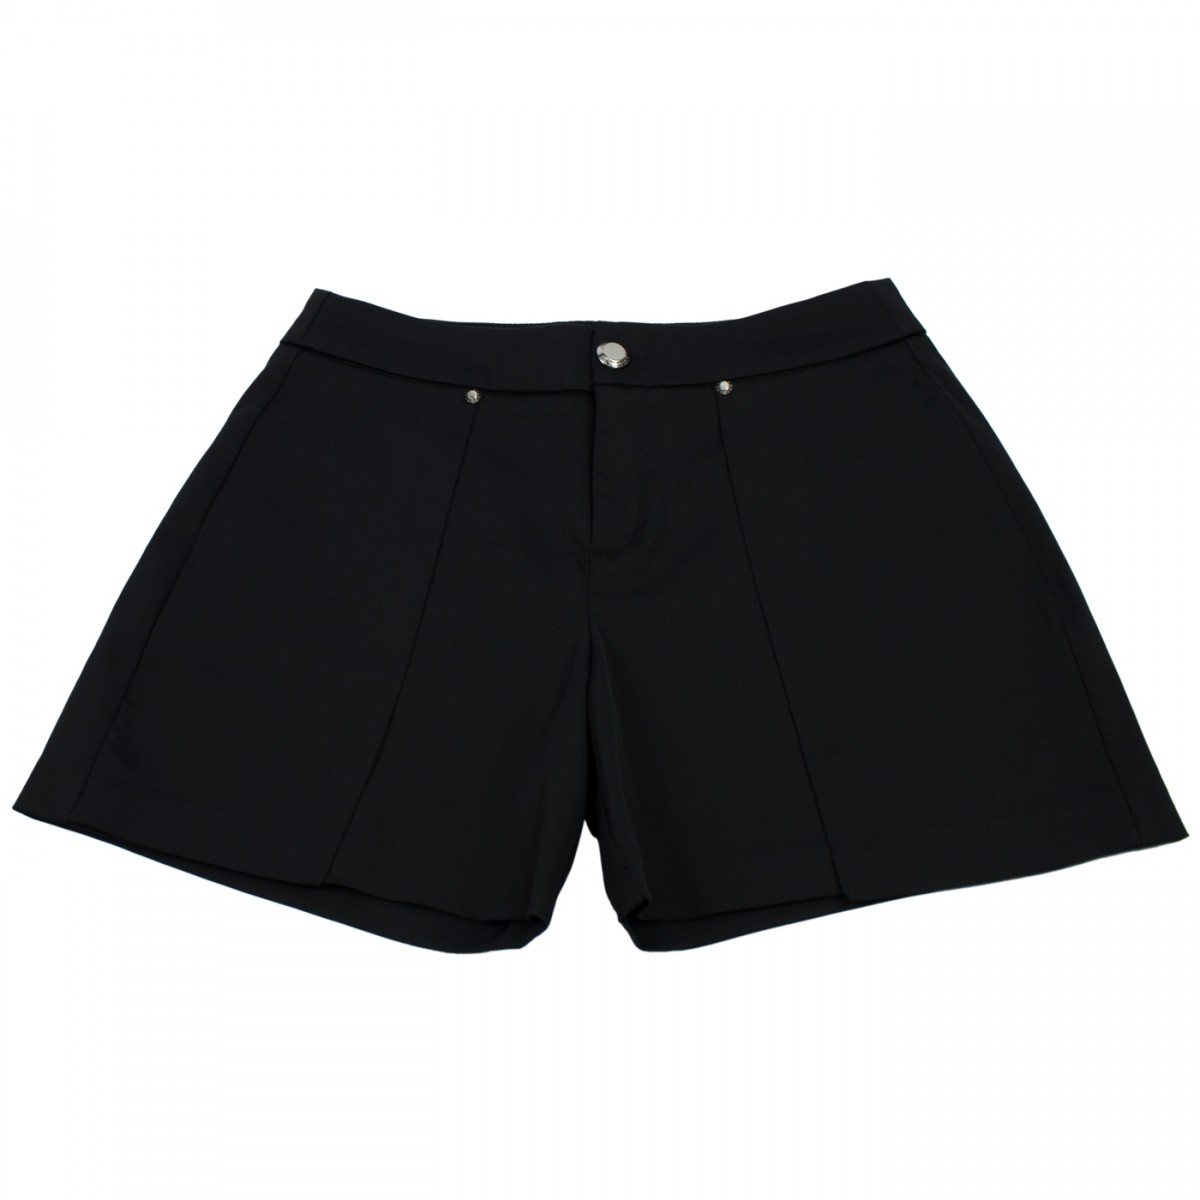 be2483f123f Bizz Store - Shorts Feminino Acostamento Preto Social